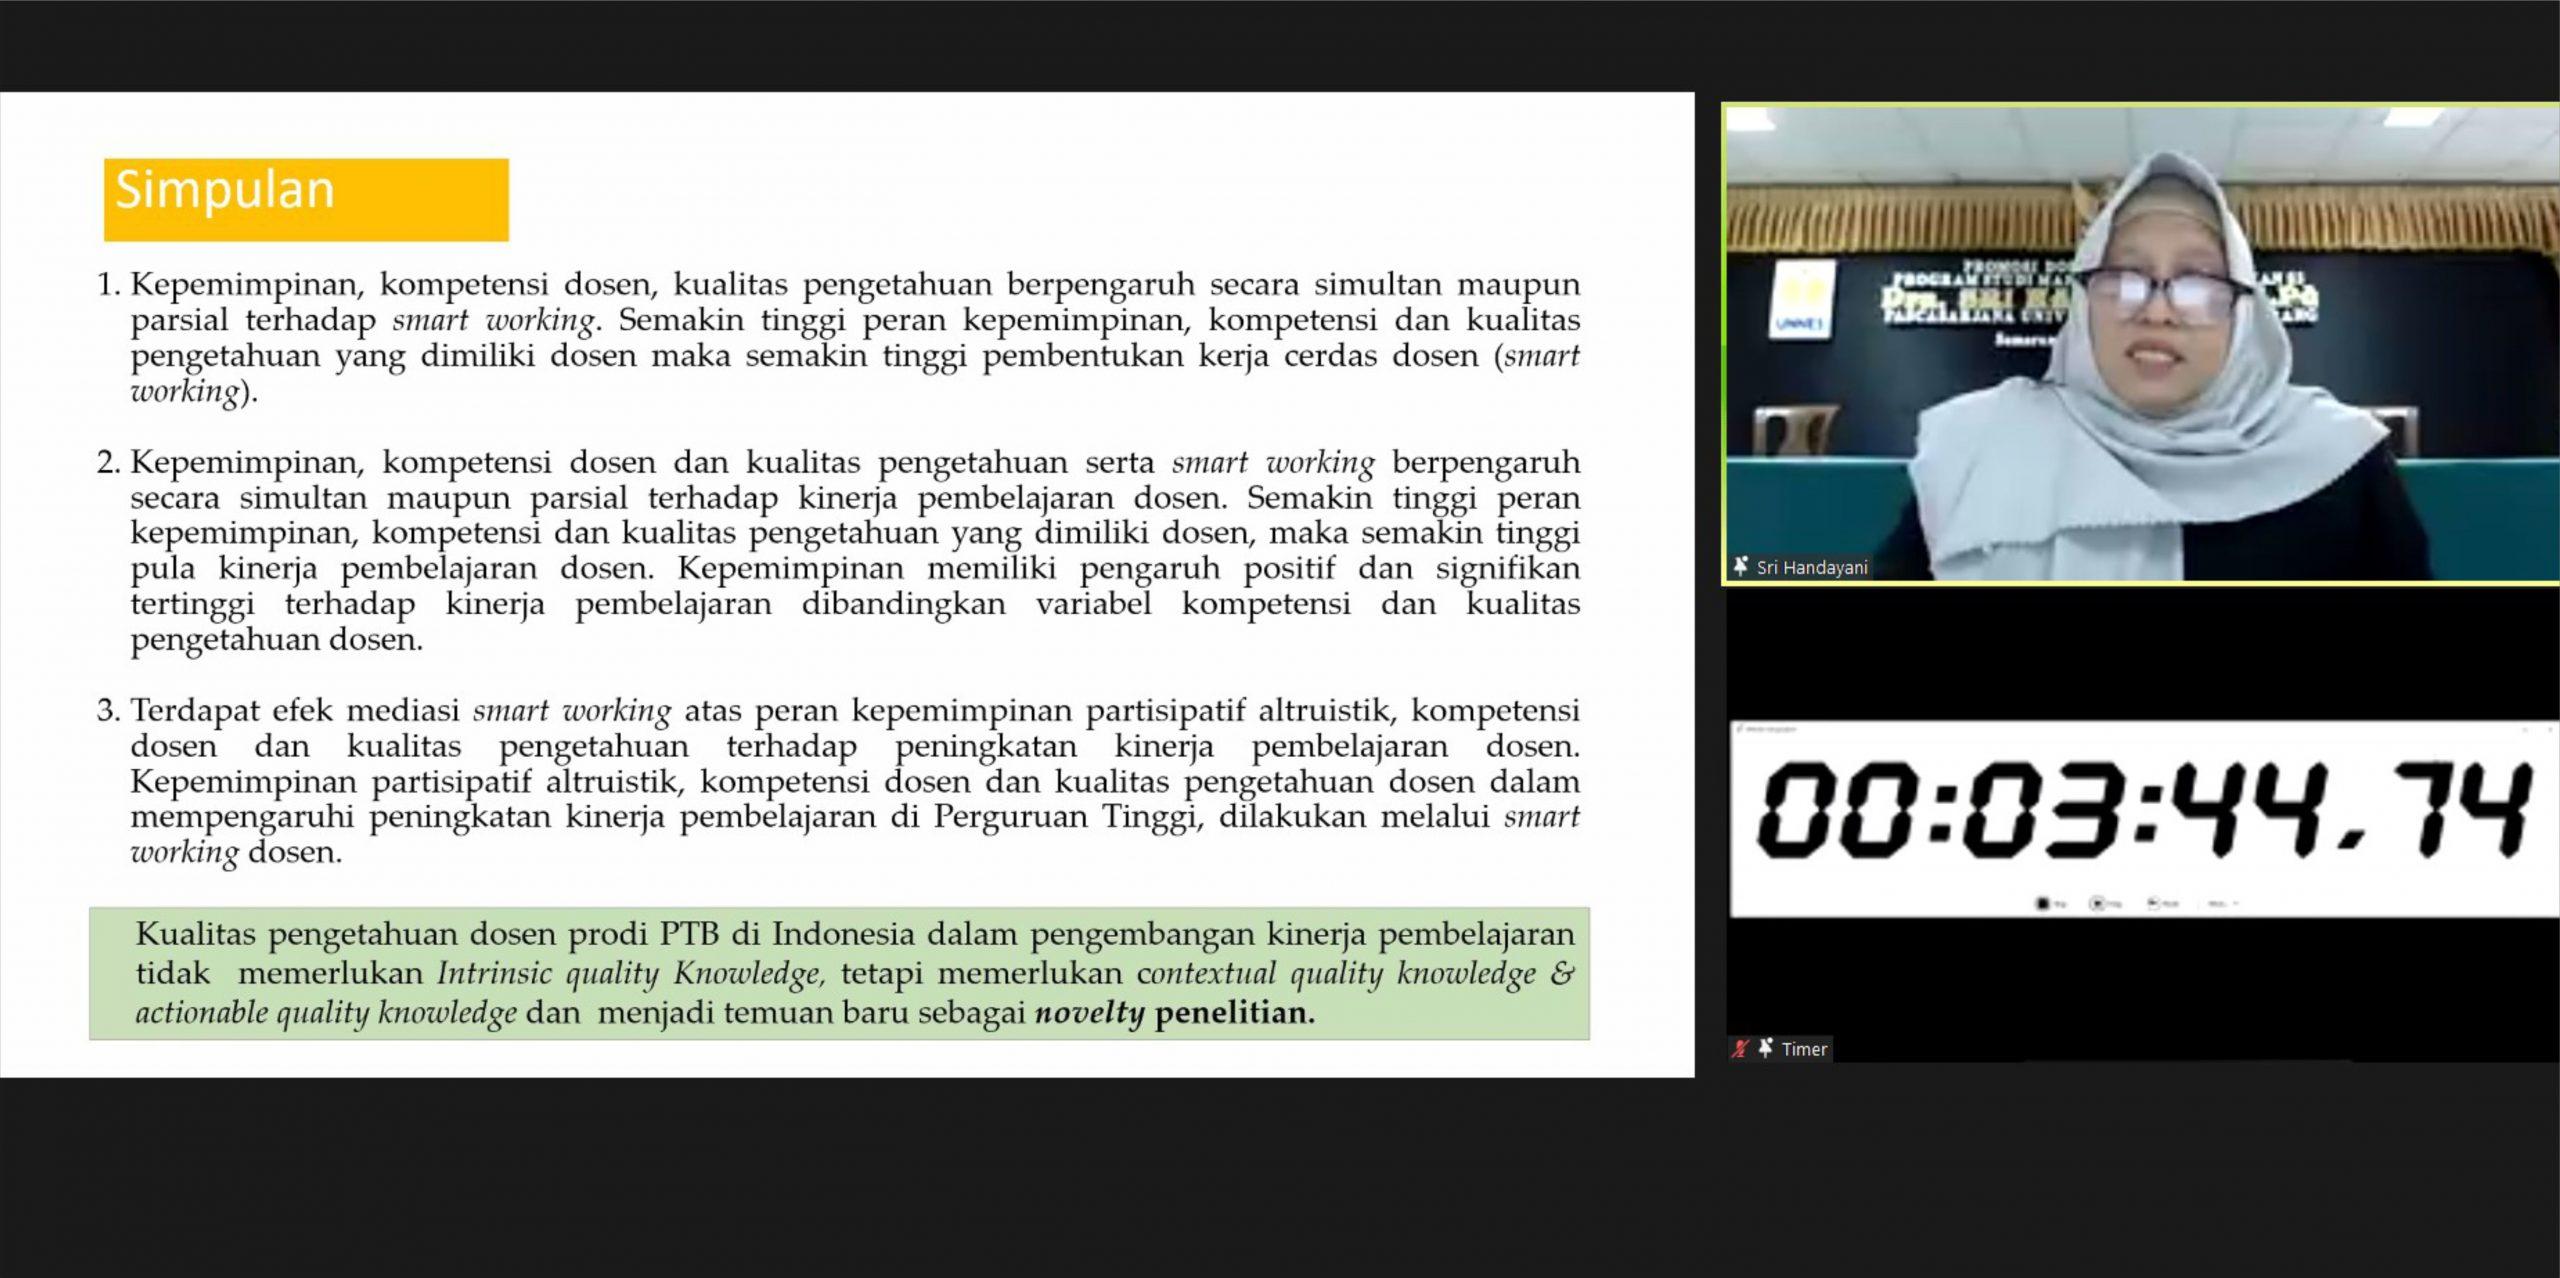 Teliti Kinerja Pembelajaran Dosen Prodi Pendidikan Teknik Bangunan di Perguruan Tinggi Seluruh Indonesia, Wakil Dekan II FT Raih Gelar Doktor